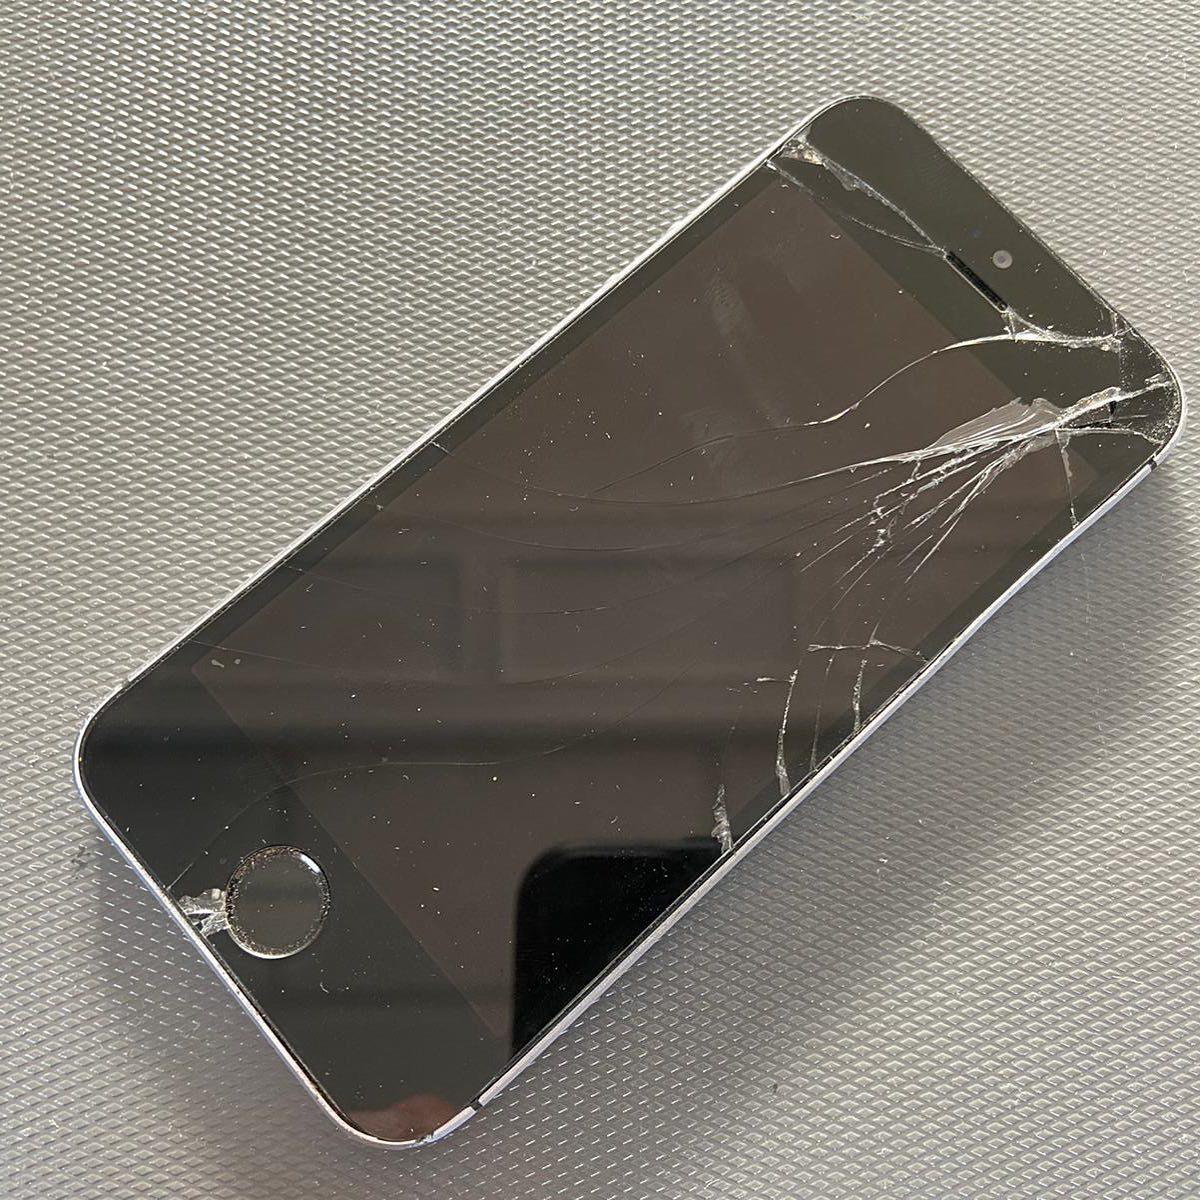 Apple iPhone Displayaustausch